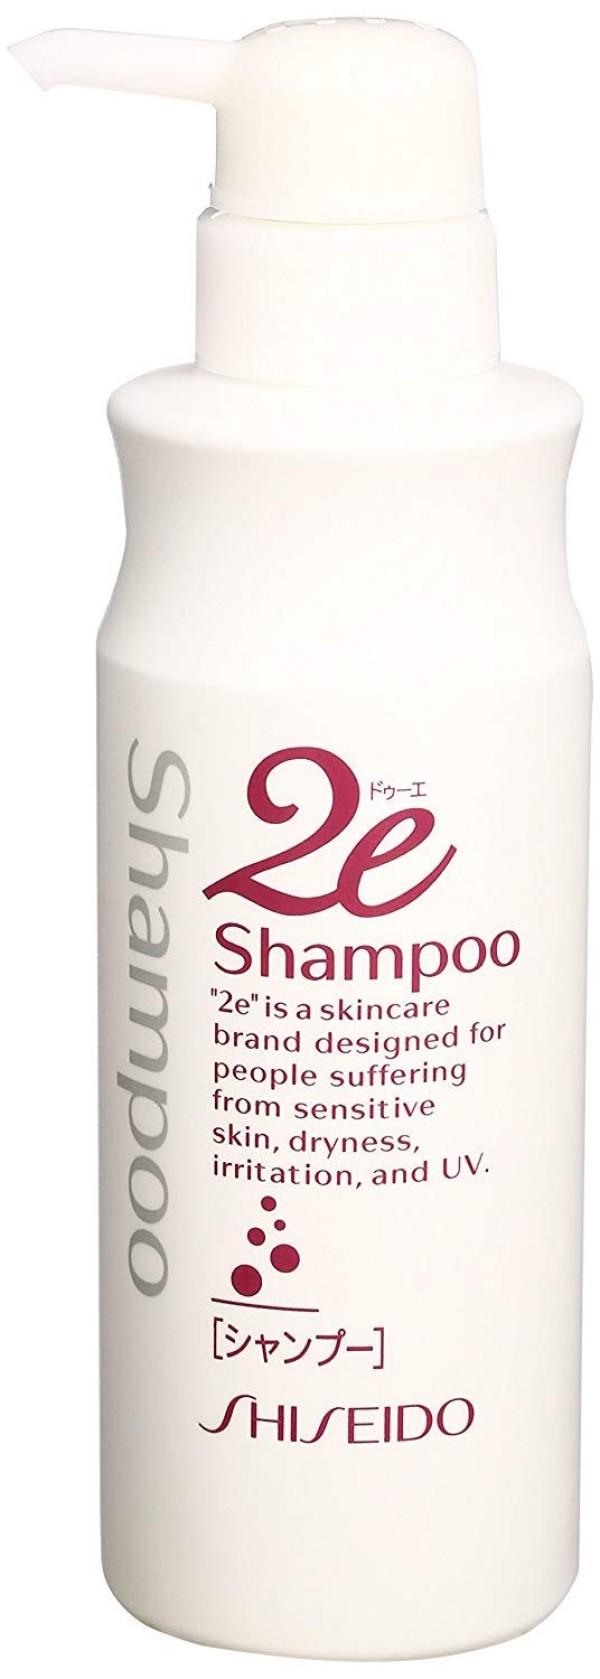 Шампунь Shiseido 2e Hair Shampoo for Sensitive Skin для чувствительной кожи головы